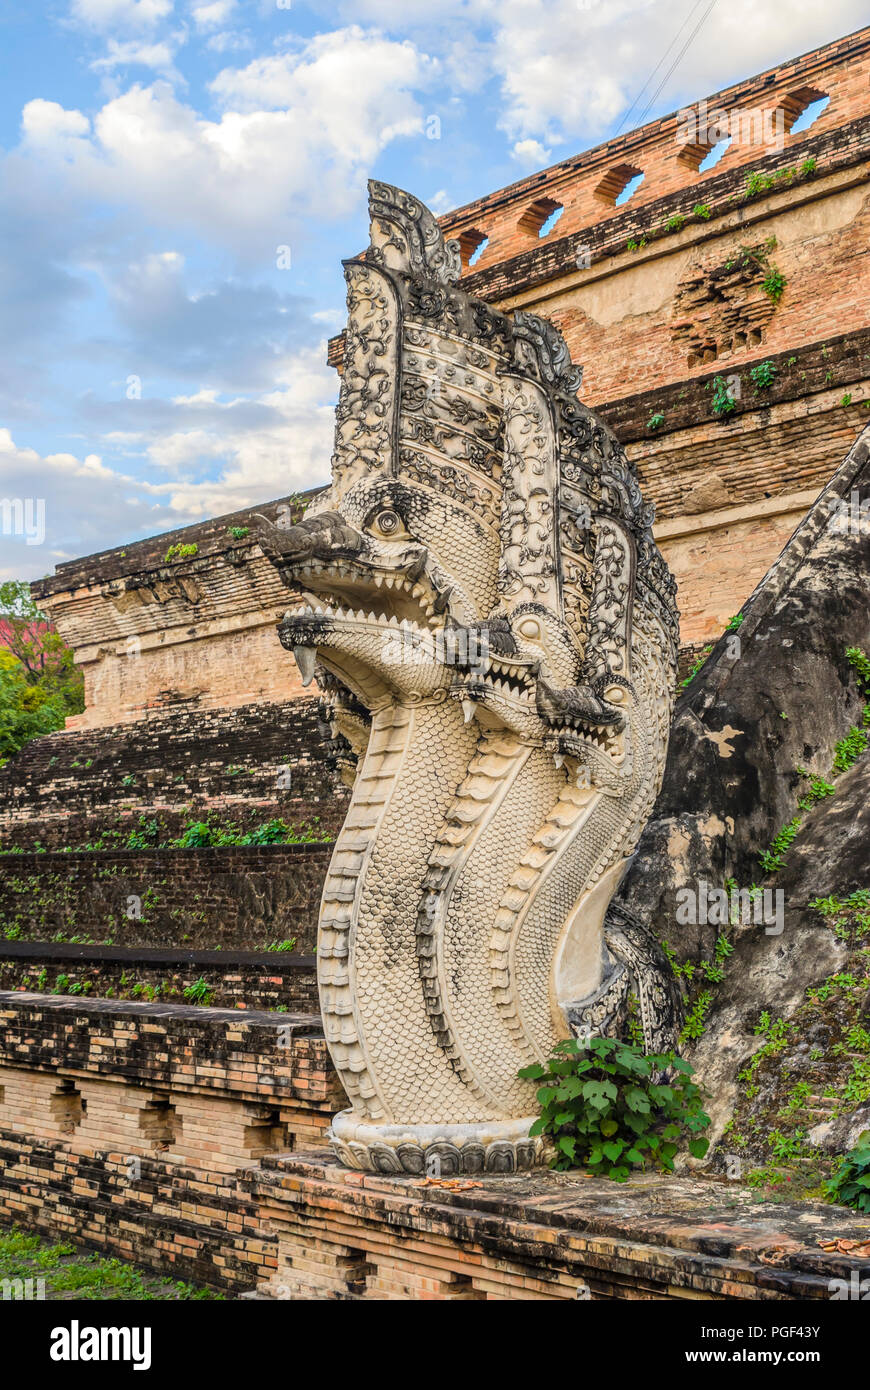 Detail of a Buddhist Naga Snake at Wat Chedi Luang, Chiang Mai, Thailand | Detail einer buddhistischen Naga Schlange im Wat Chedi Luang, Chiang Mai, T - Stock Image